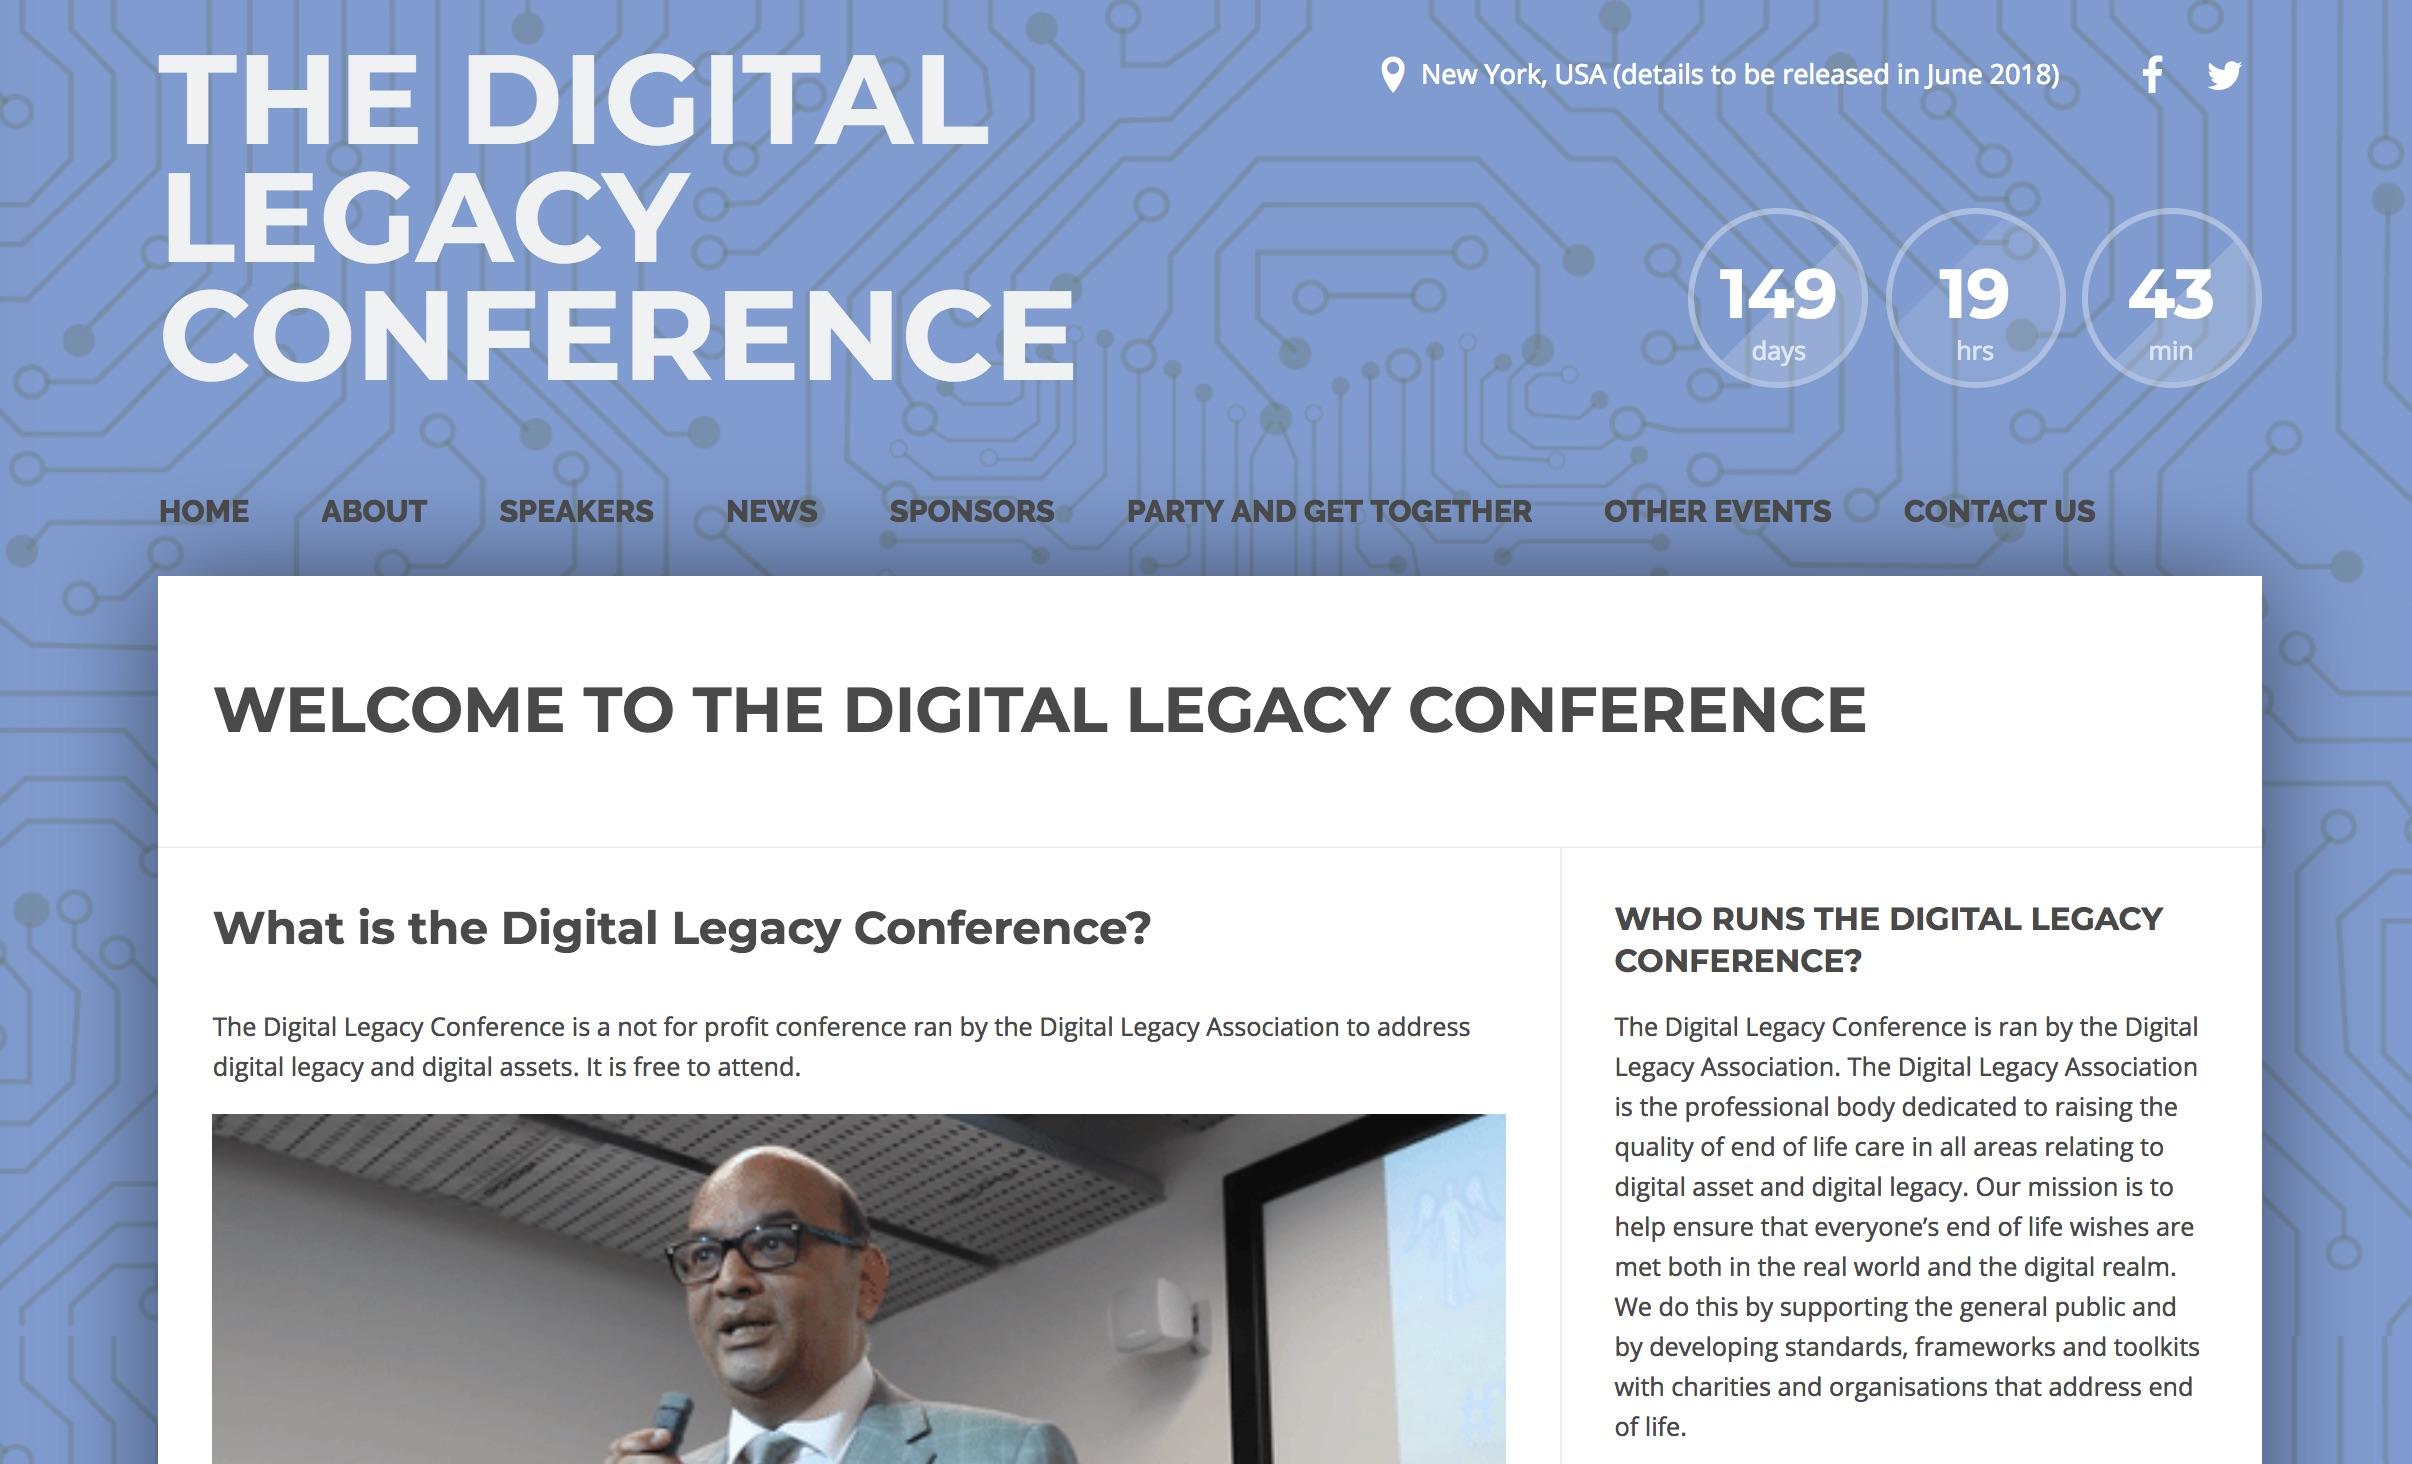 Digital Legacy Conference